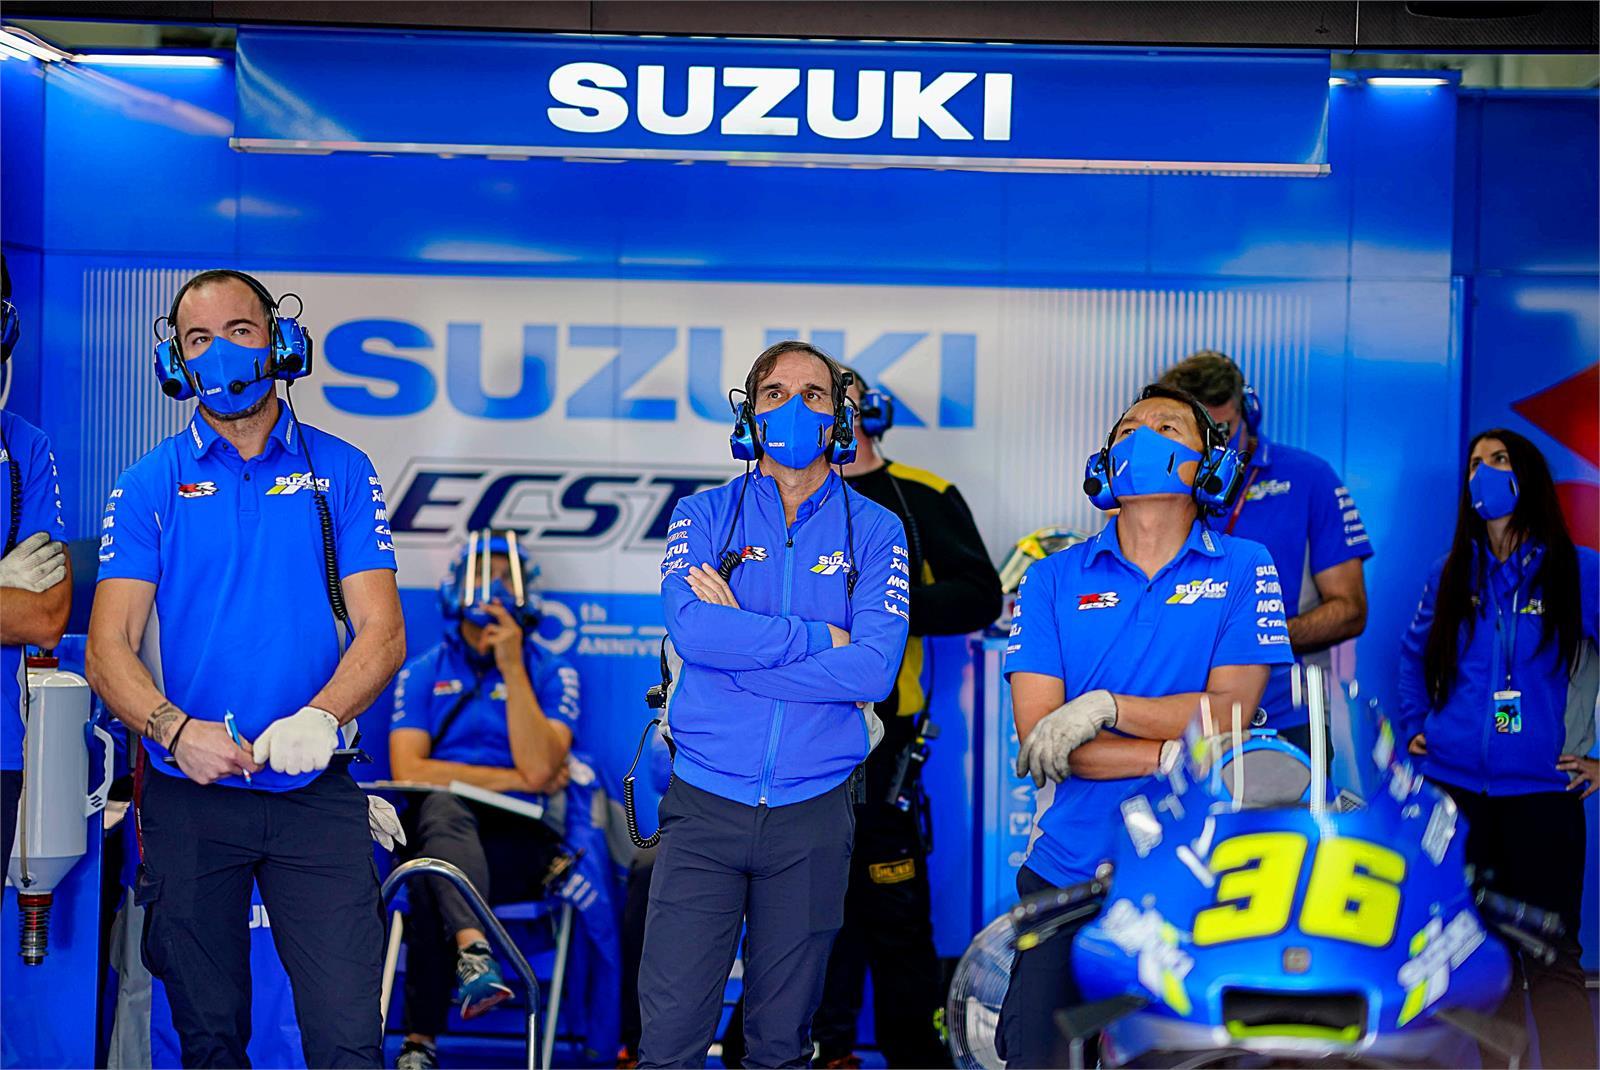 Davide Brivio, Suzuki Ecstar, Valencia 2020, MotoGP